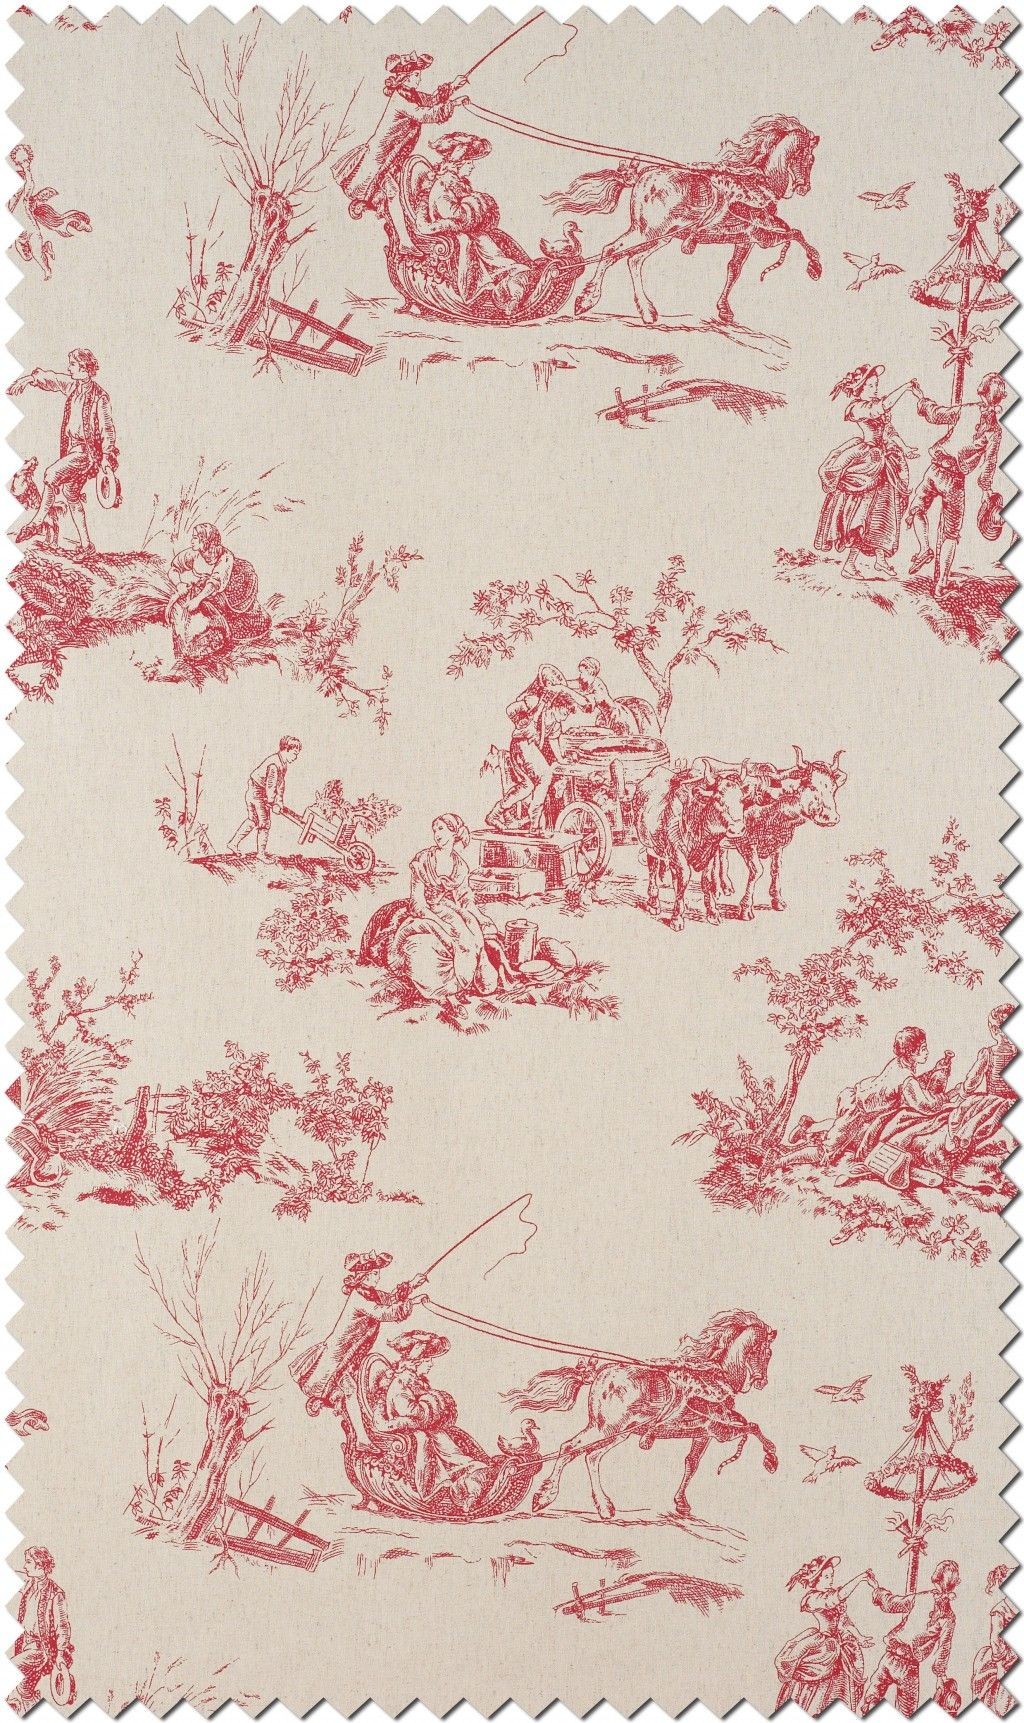 toile de jouy fabric collection of casadeco amboise telas pinterest toile de jouy toiles. Black Bedroom Furniture Sets. Home Design Ideas